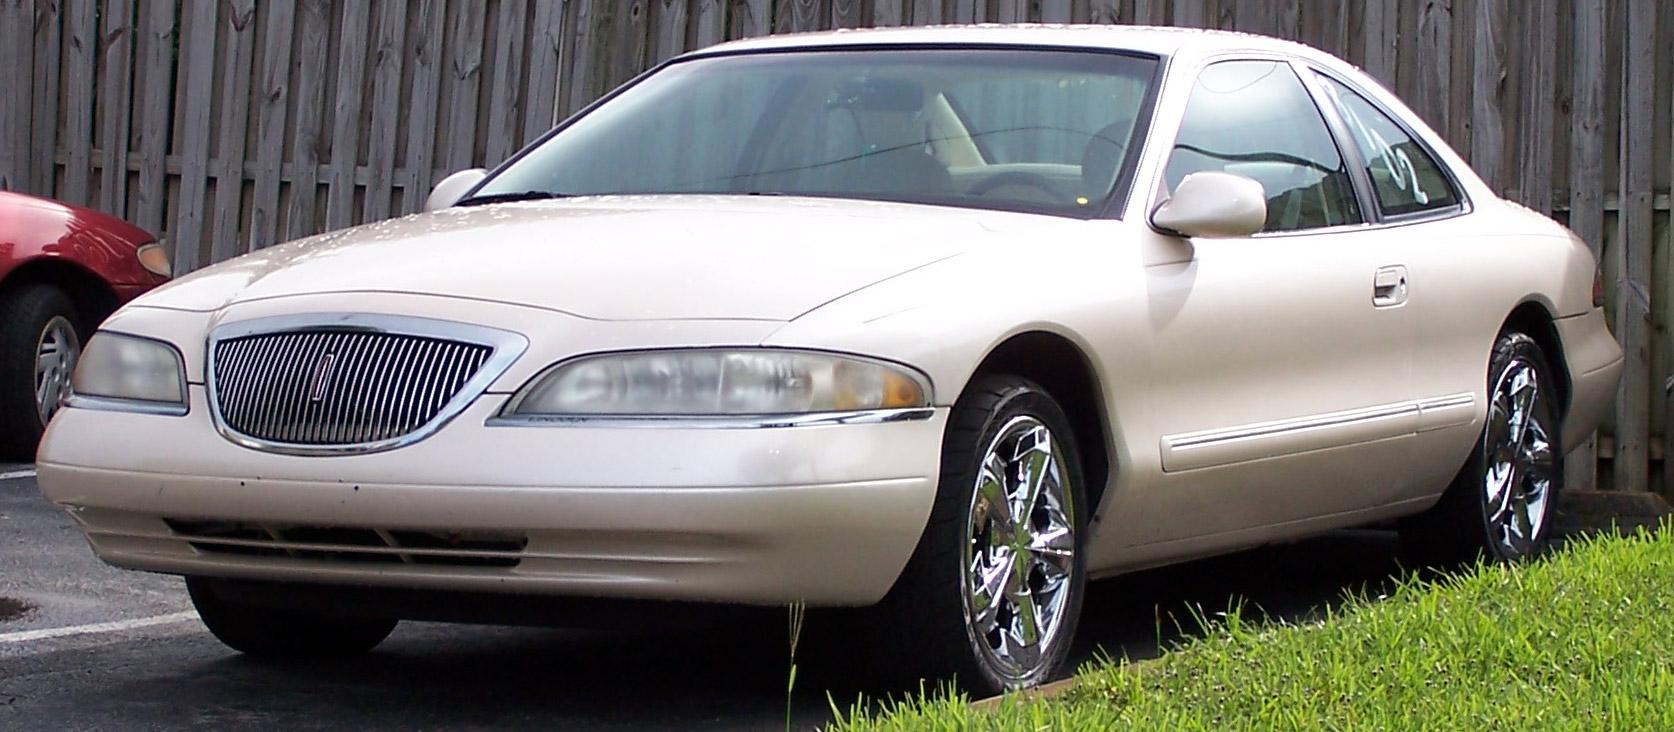 1998 Lincoln Mark Viii Image 11